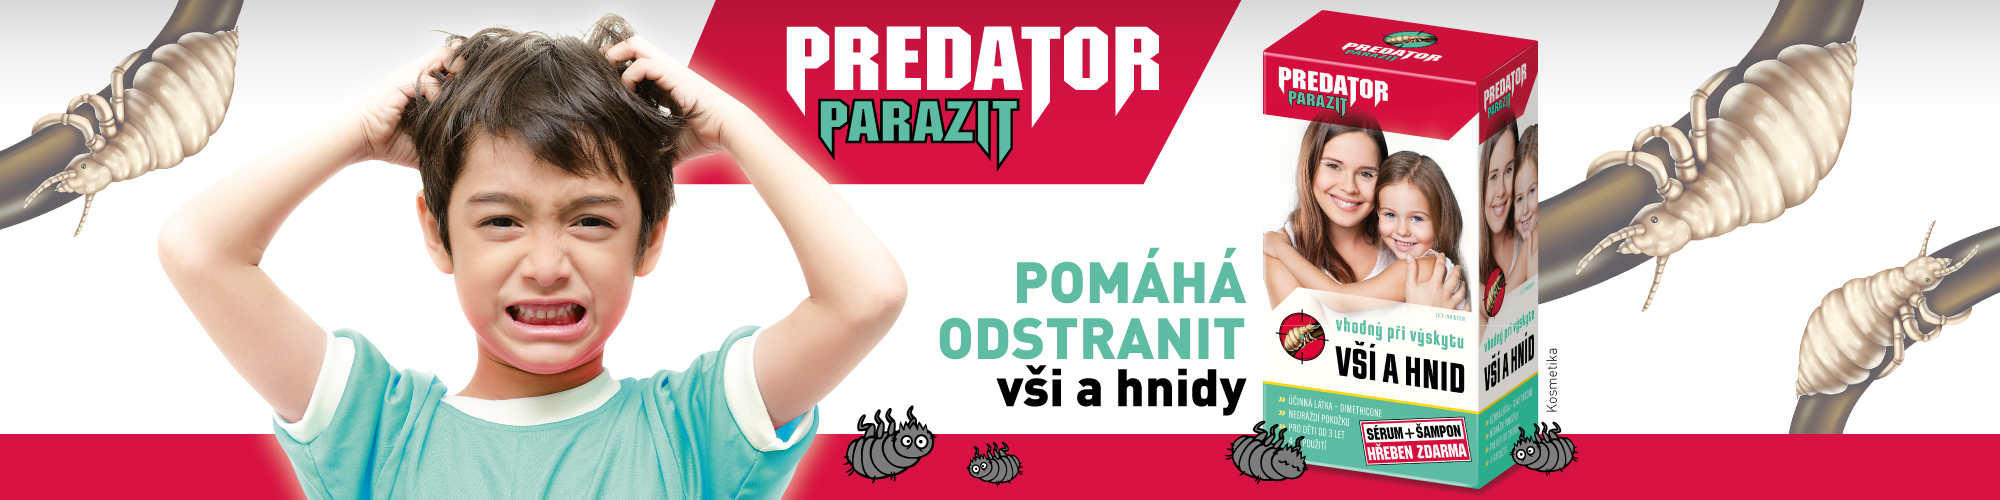 Predator Parazit